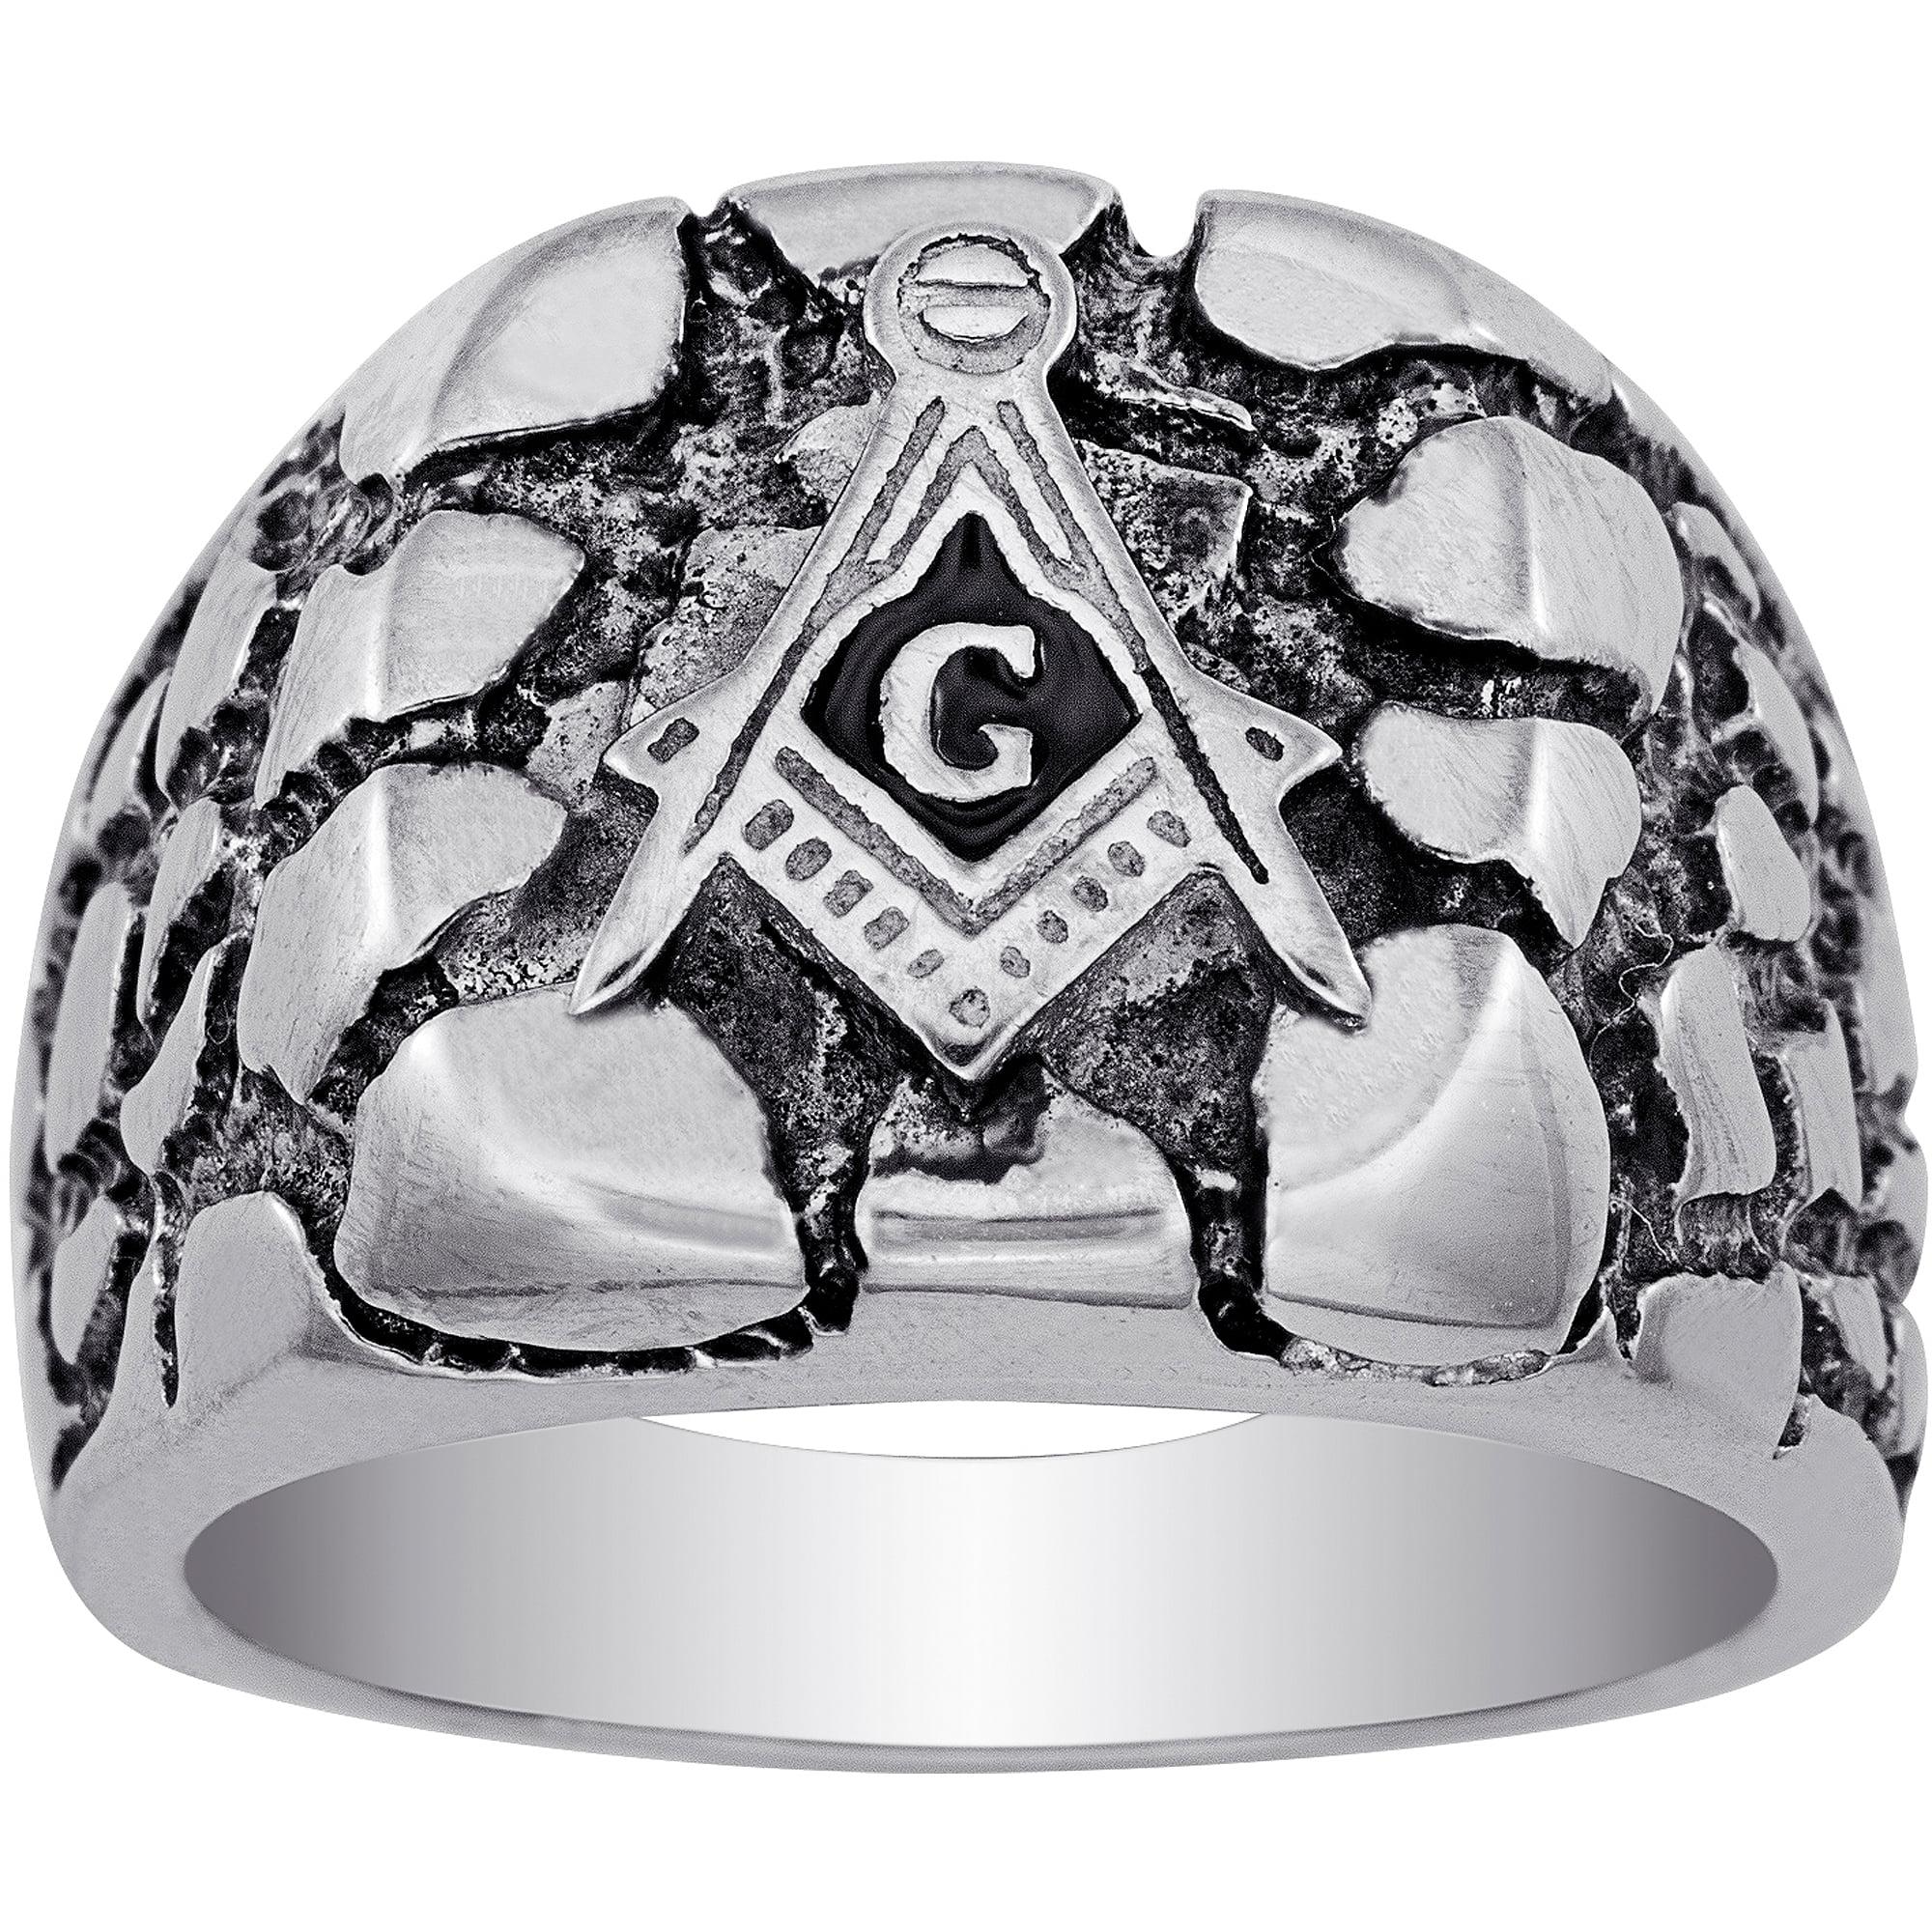 Mens Mason Ring Black IP Stainless Steel Freemason Lodge Compass Square 8 10 12